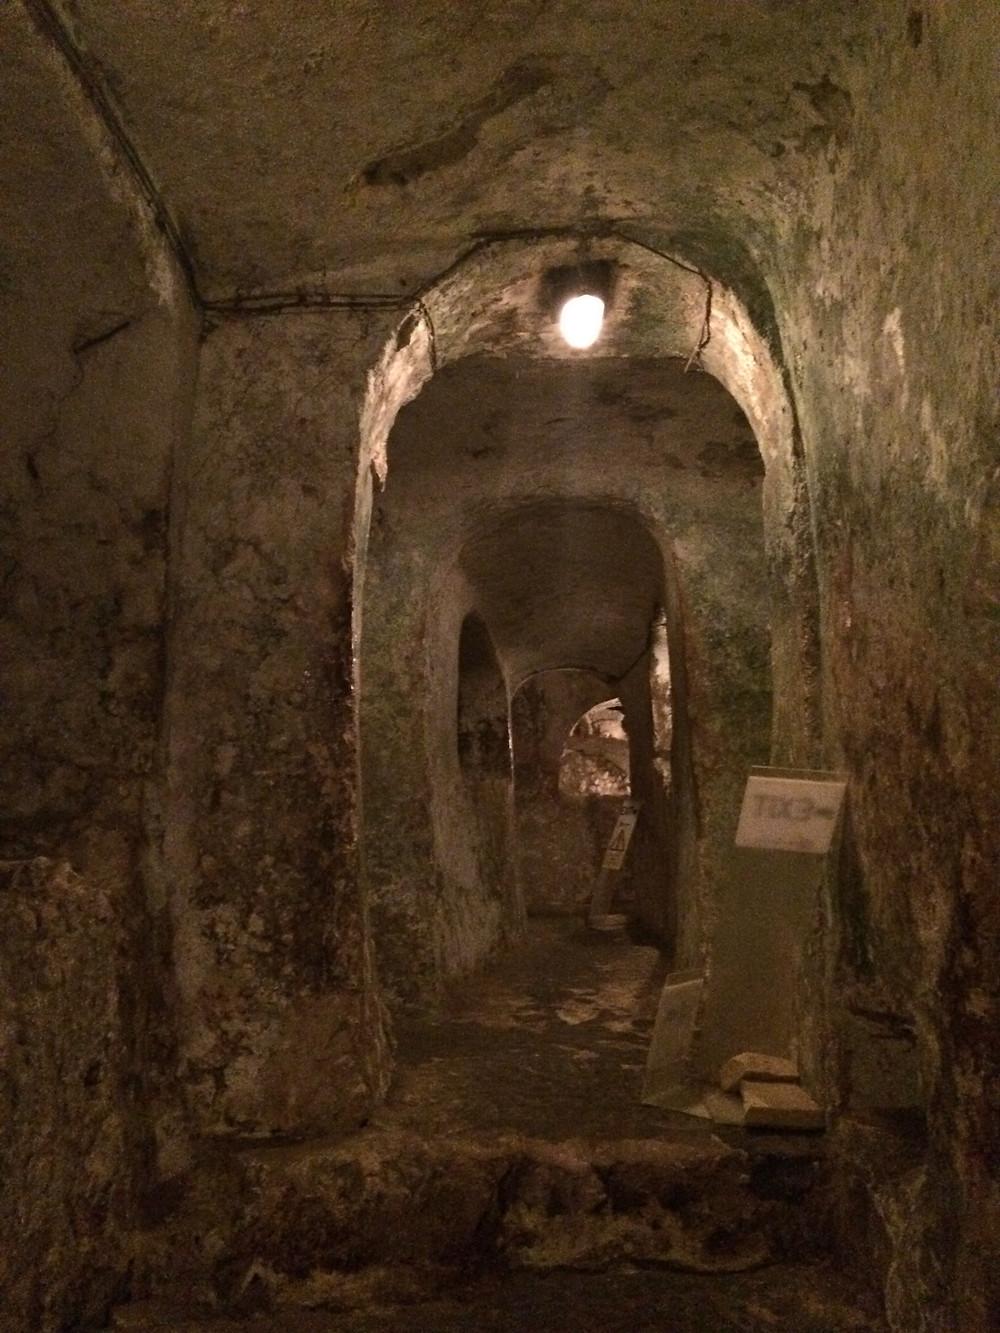 St.Pauls Catacombs - Corridors - 2mi3